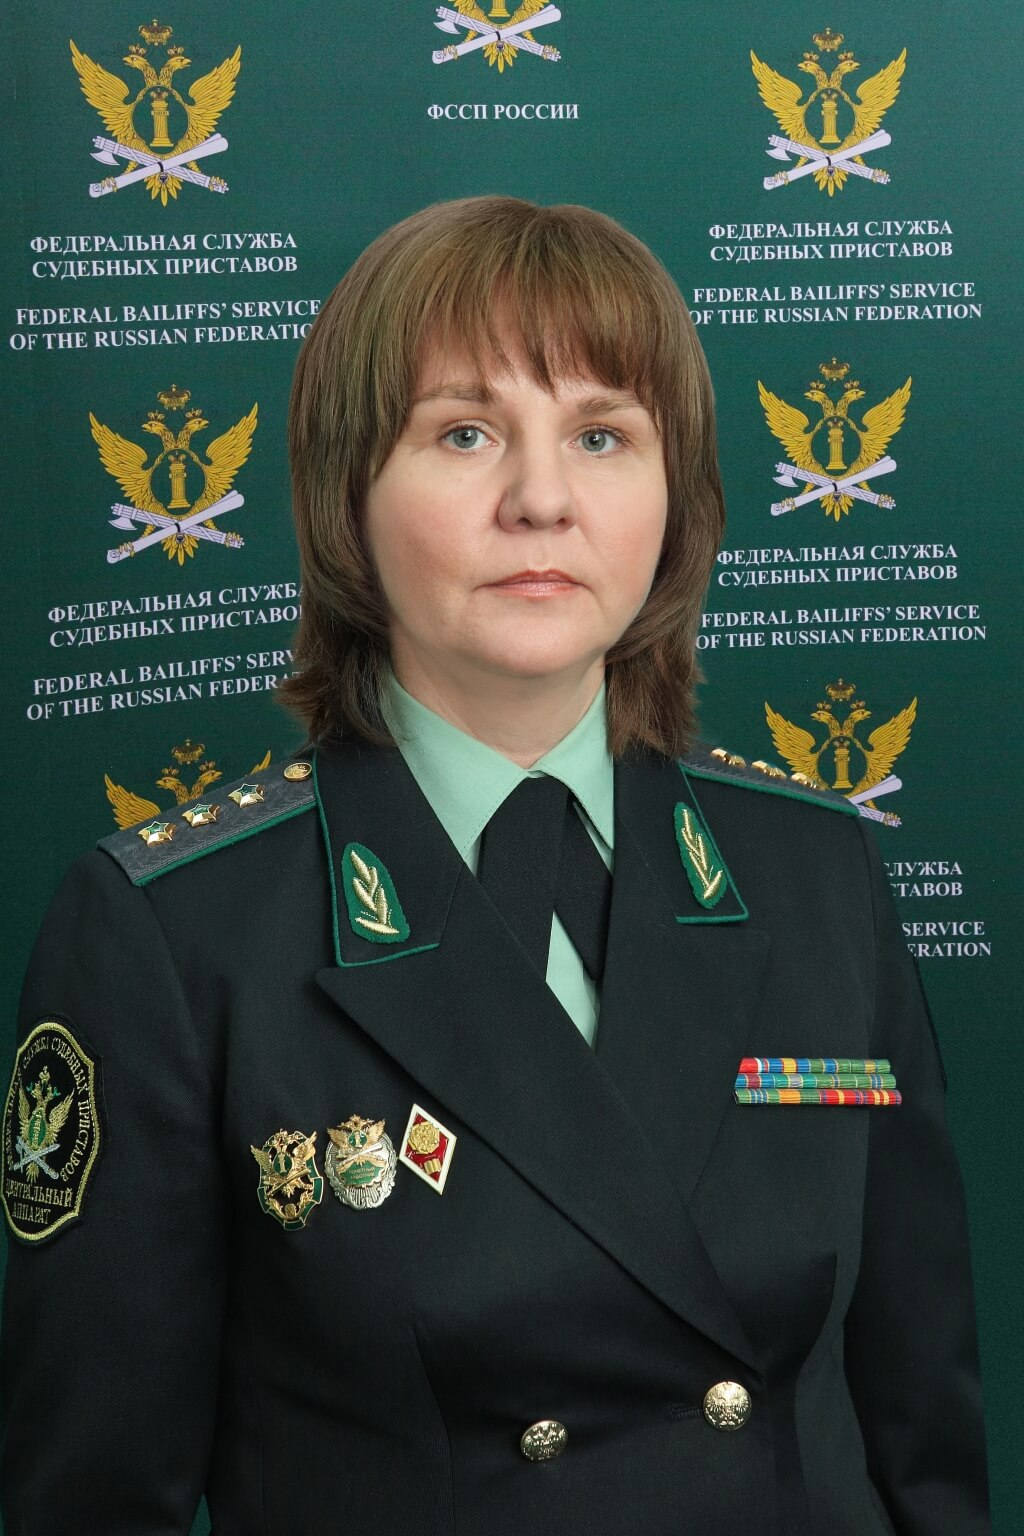 Салькова Наталия Владимировна